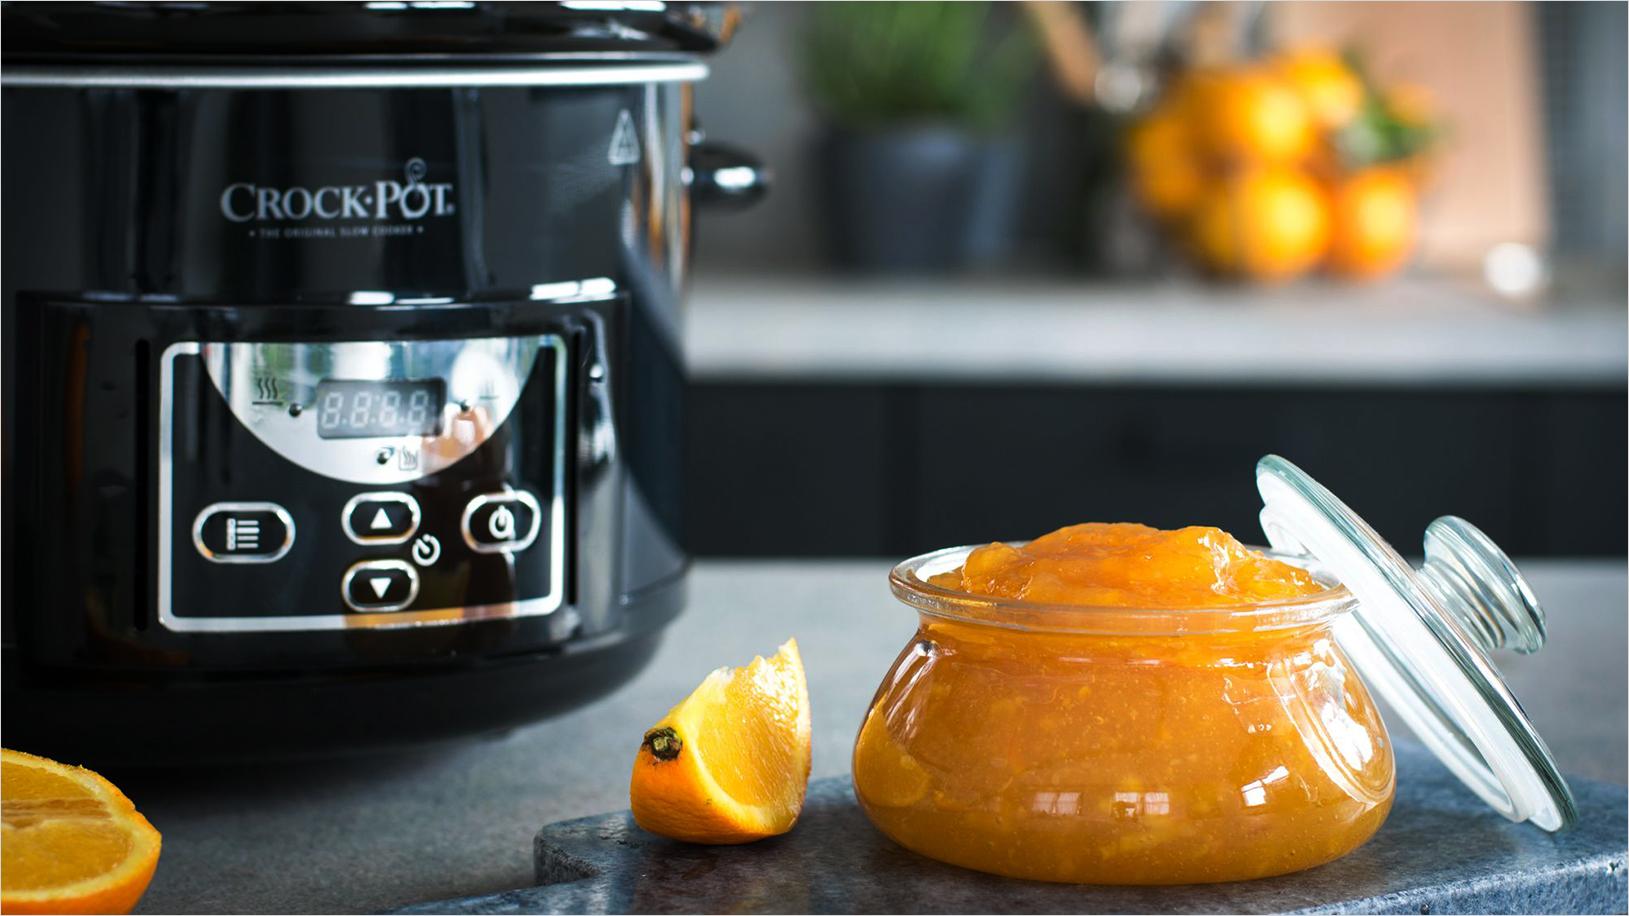 Crockpot Slow Cooker - 4,7 L Digitale